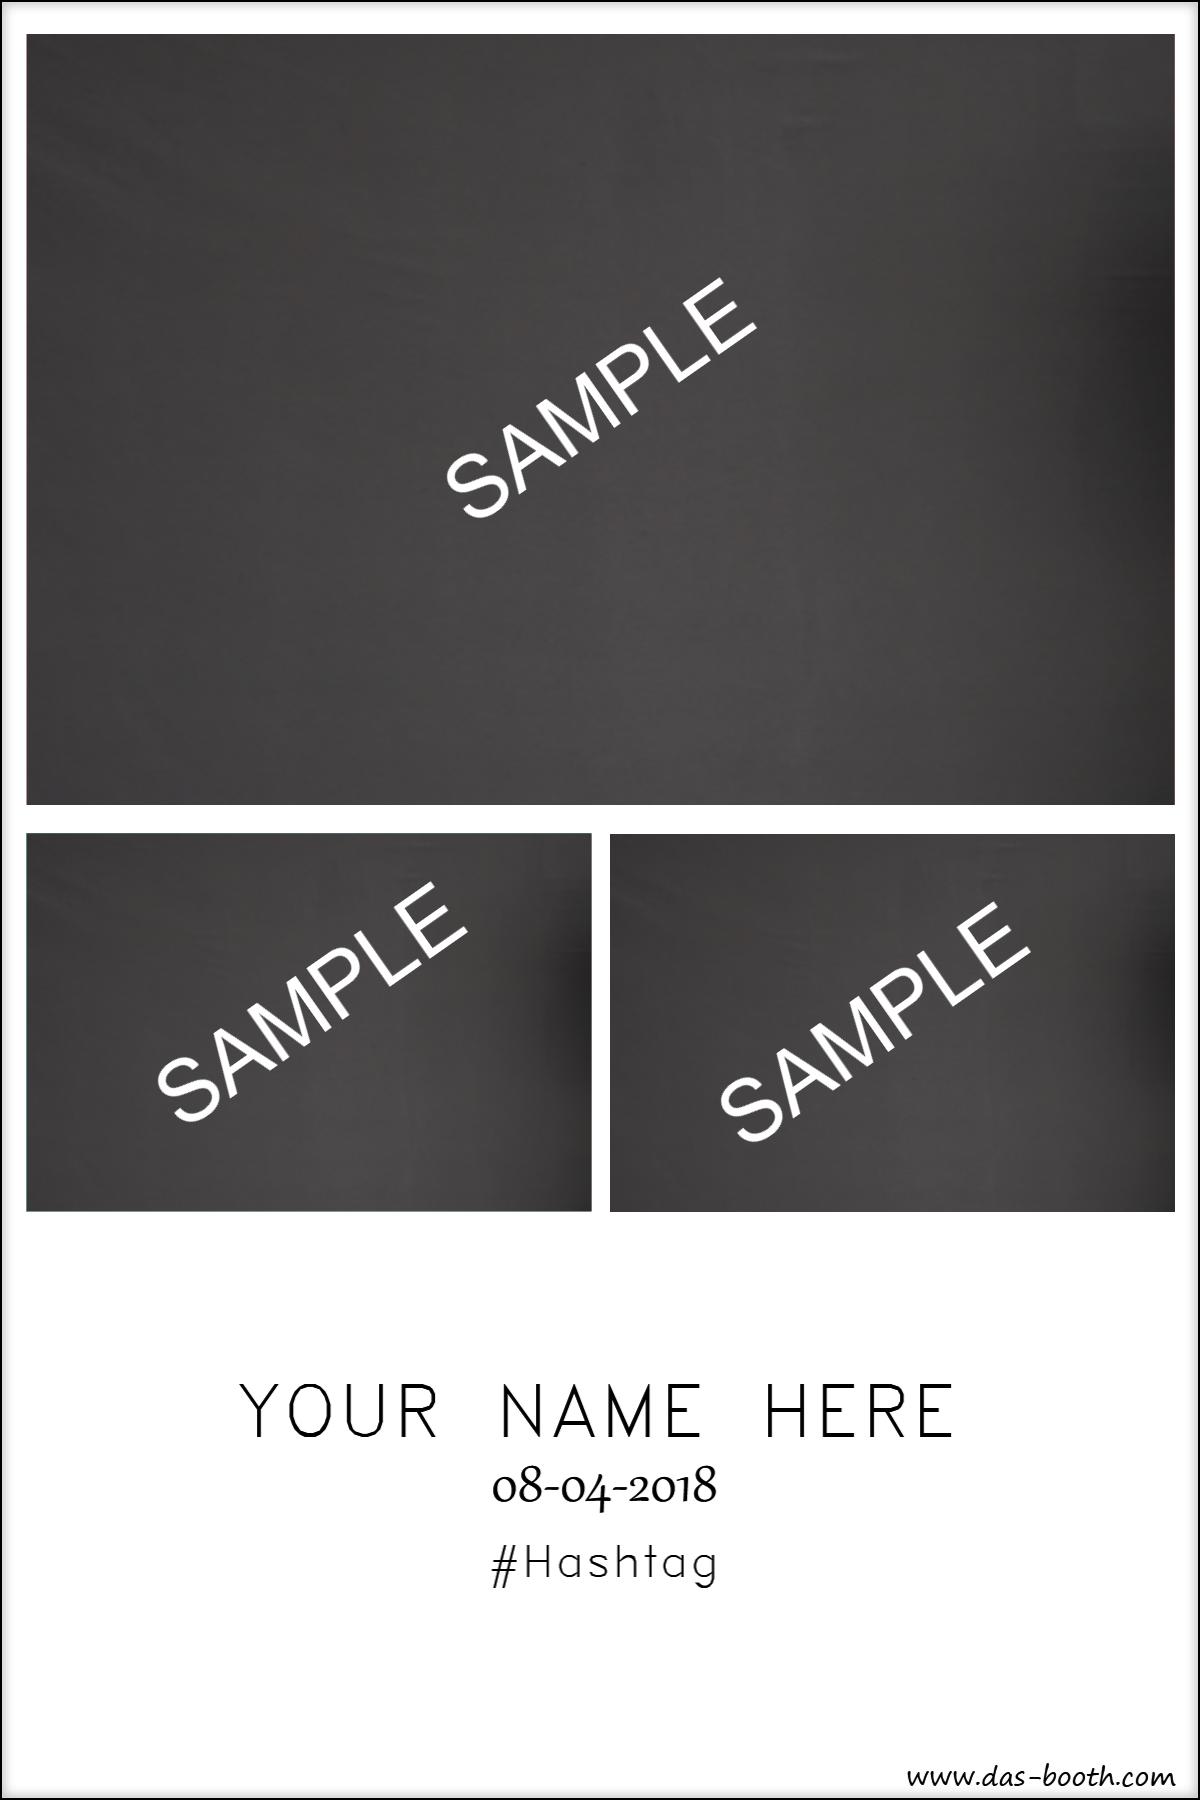 3 photos - vertical - sample2.png